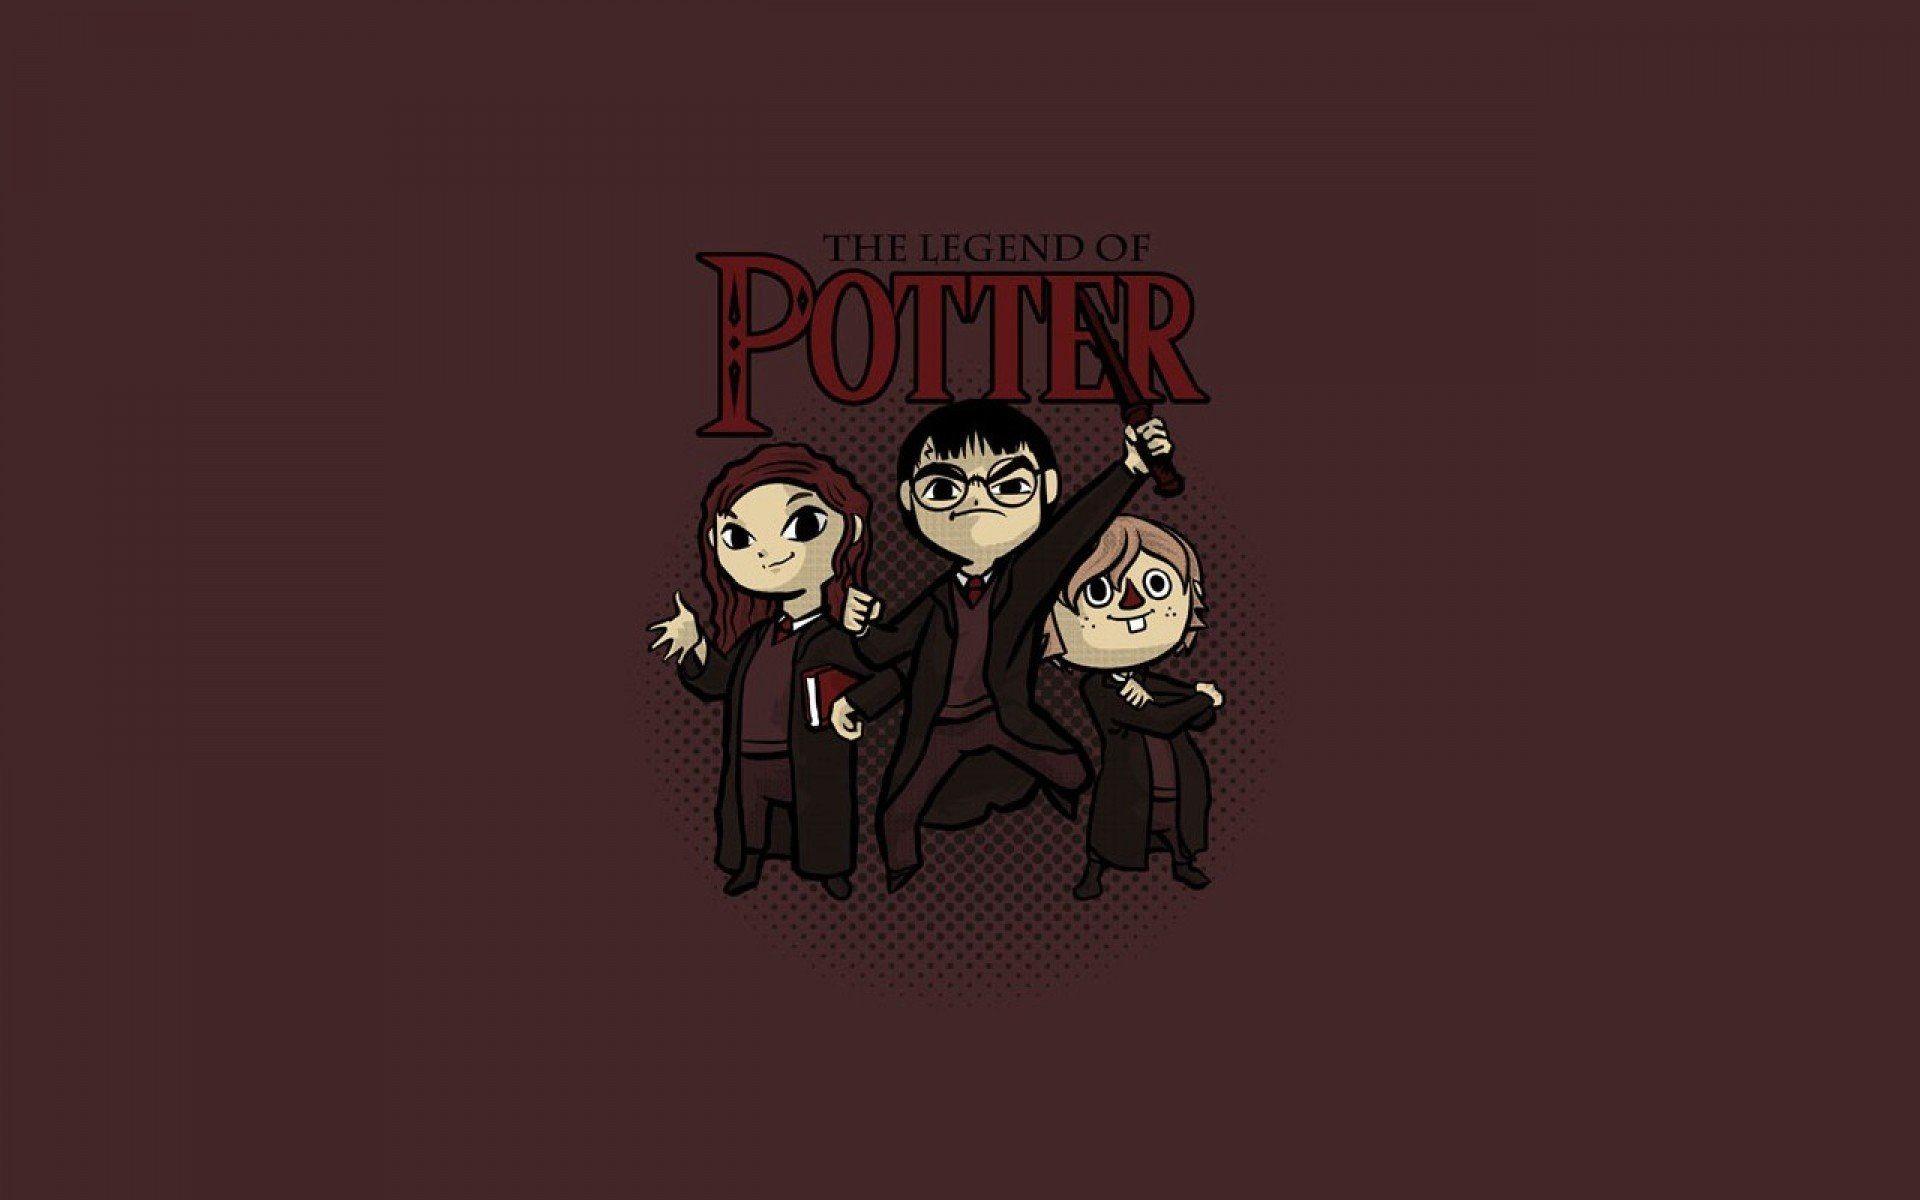 … Harry Potter Wallpaper. Download